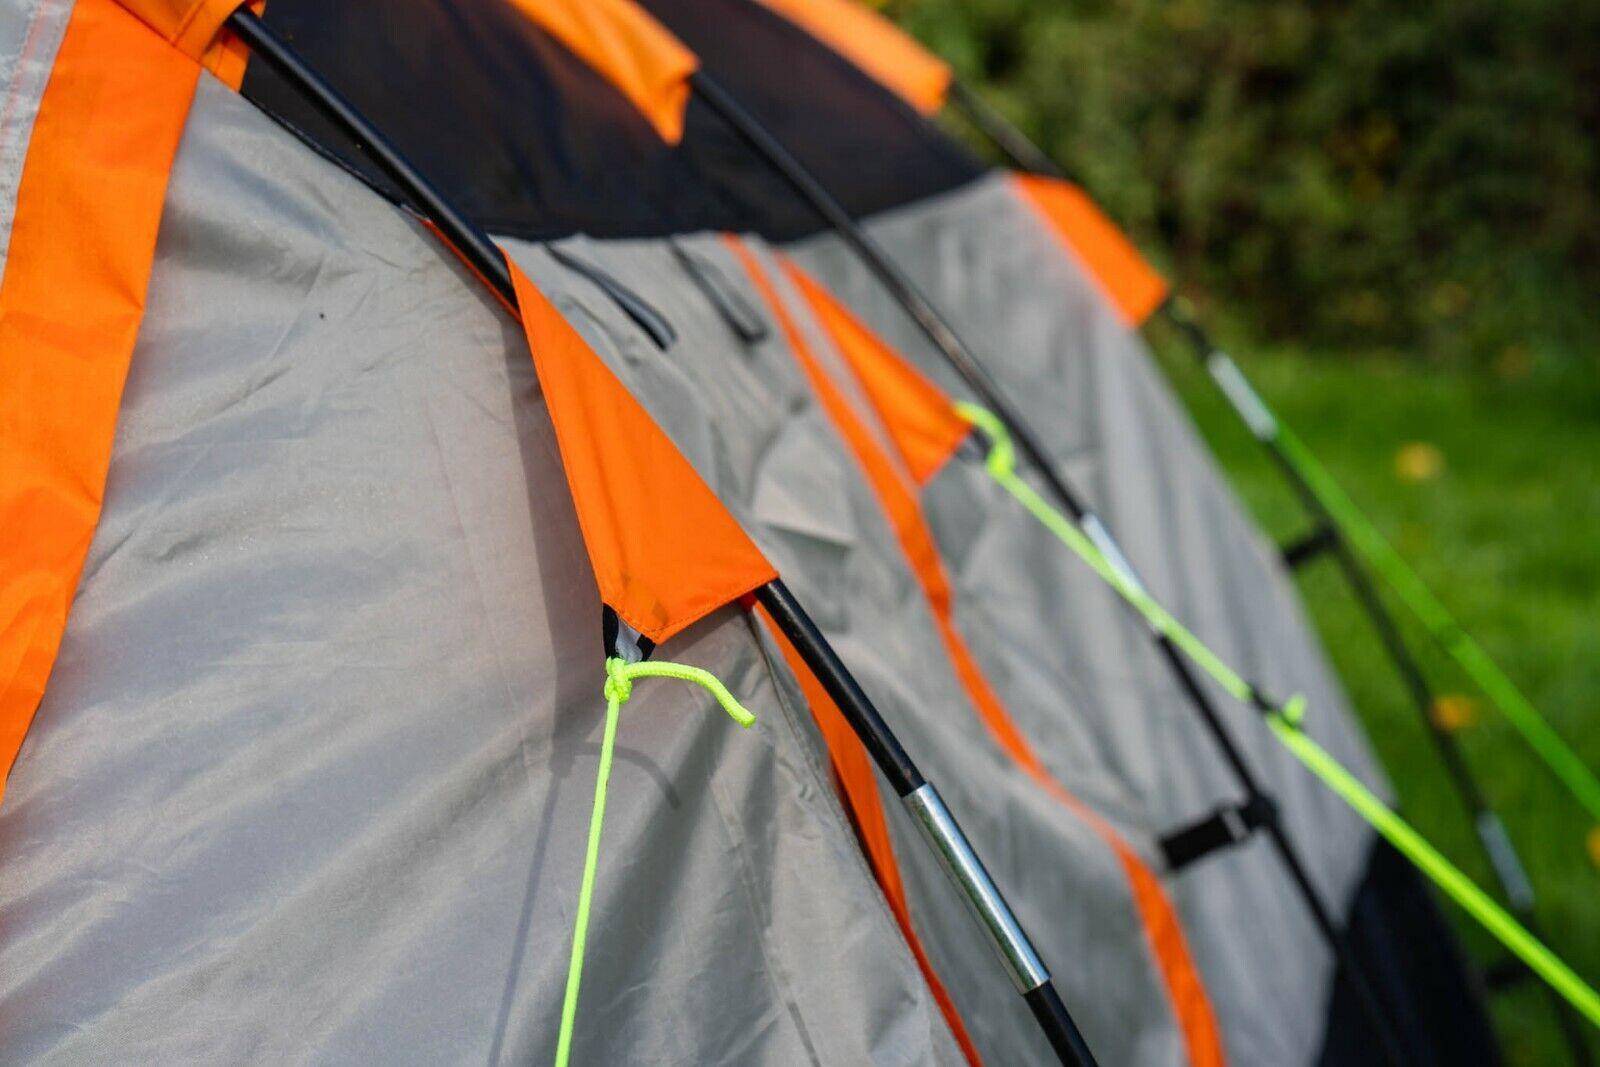 Litera Carpa Carpa Carpa familiar para fin de semana 3 & festivales-knightwick (Naranja y Negro) 6f7c84